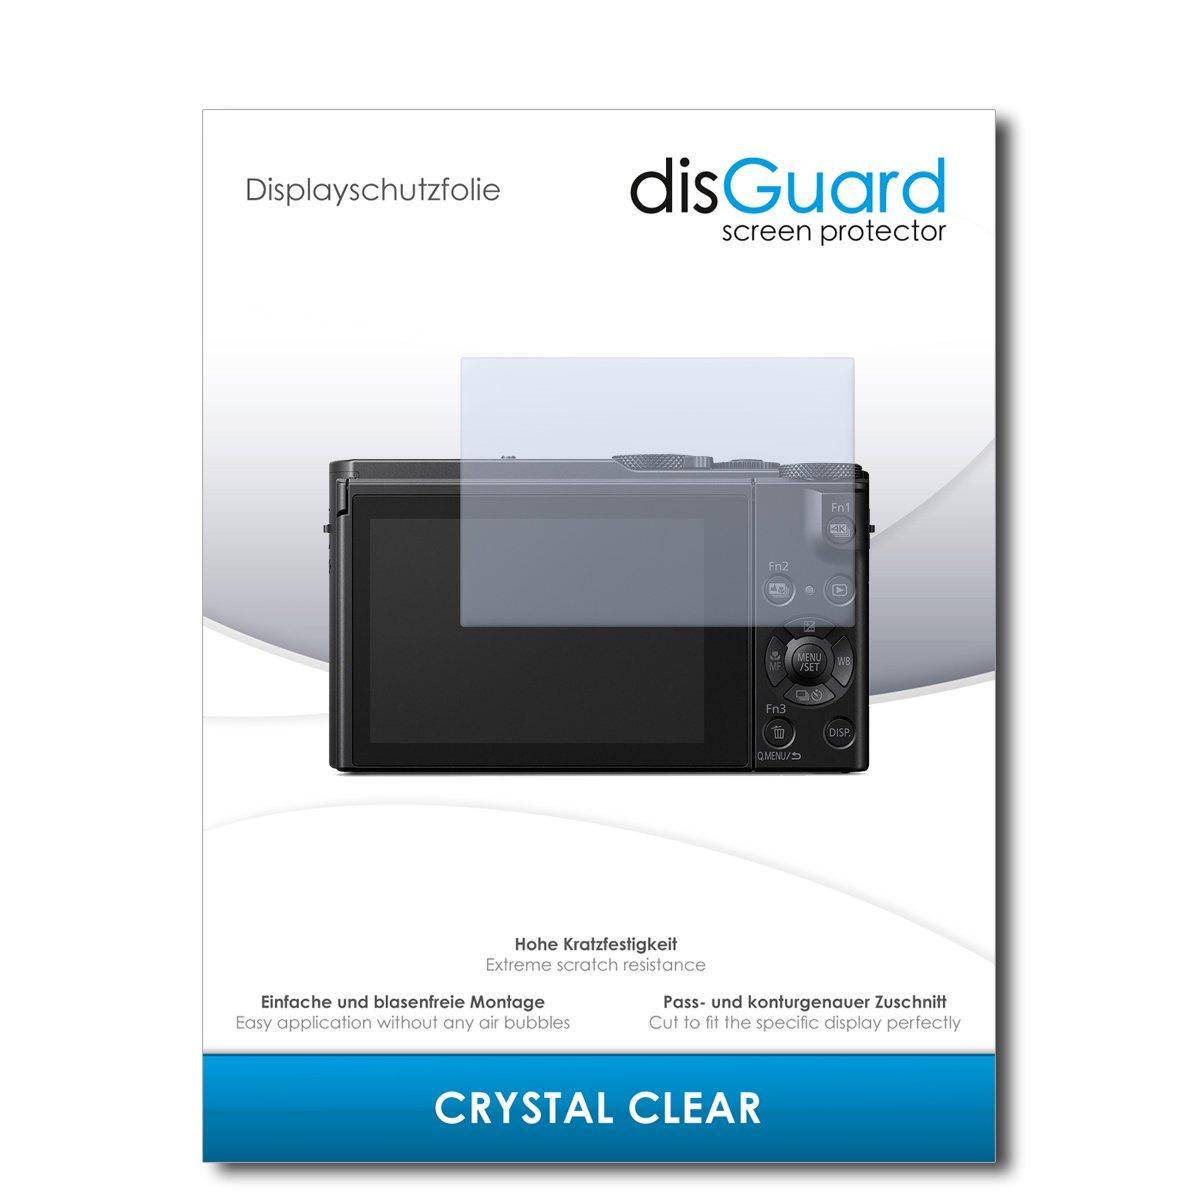 Transparente Cristal 2 Piezas disGuard/® Protector de Pantalla Anti-Ara/ñazos Anti-Huella Dactilar Pel/ícula Protectora Invisible compatibile con Panasonic Lumix DMC-LX15 Crystal Clear